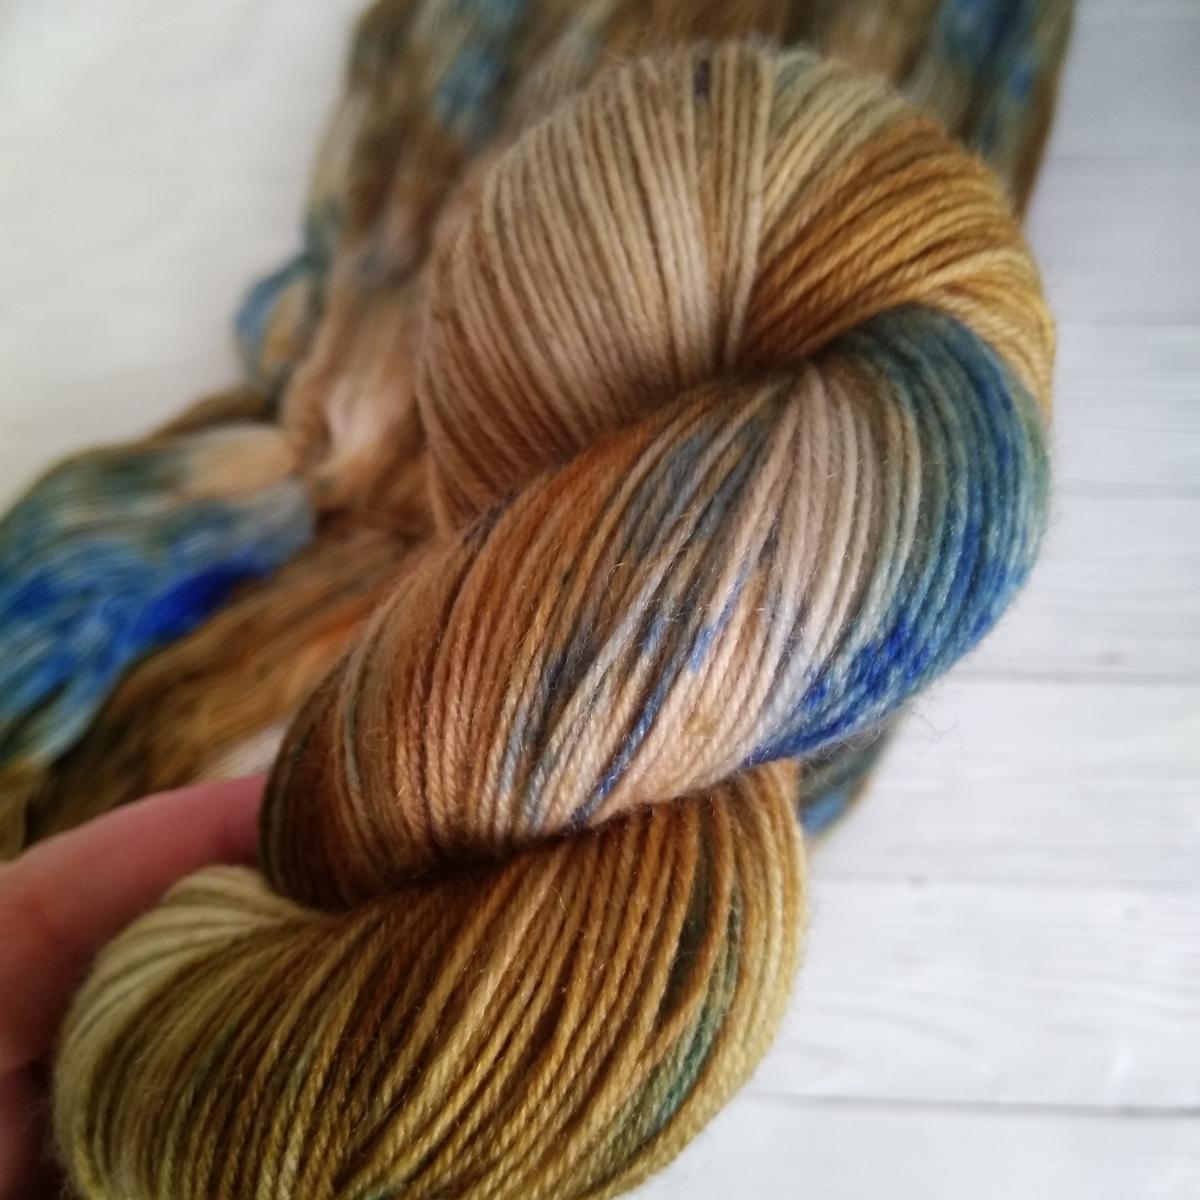 woodico.pro hand dyed yarn 036 1200x1200 - Hand dyed yarn / 036